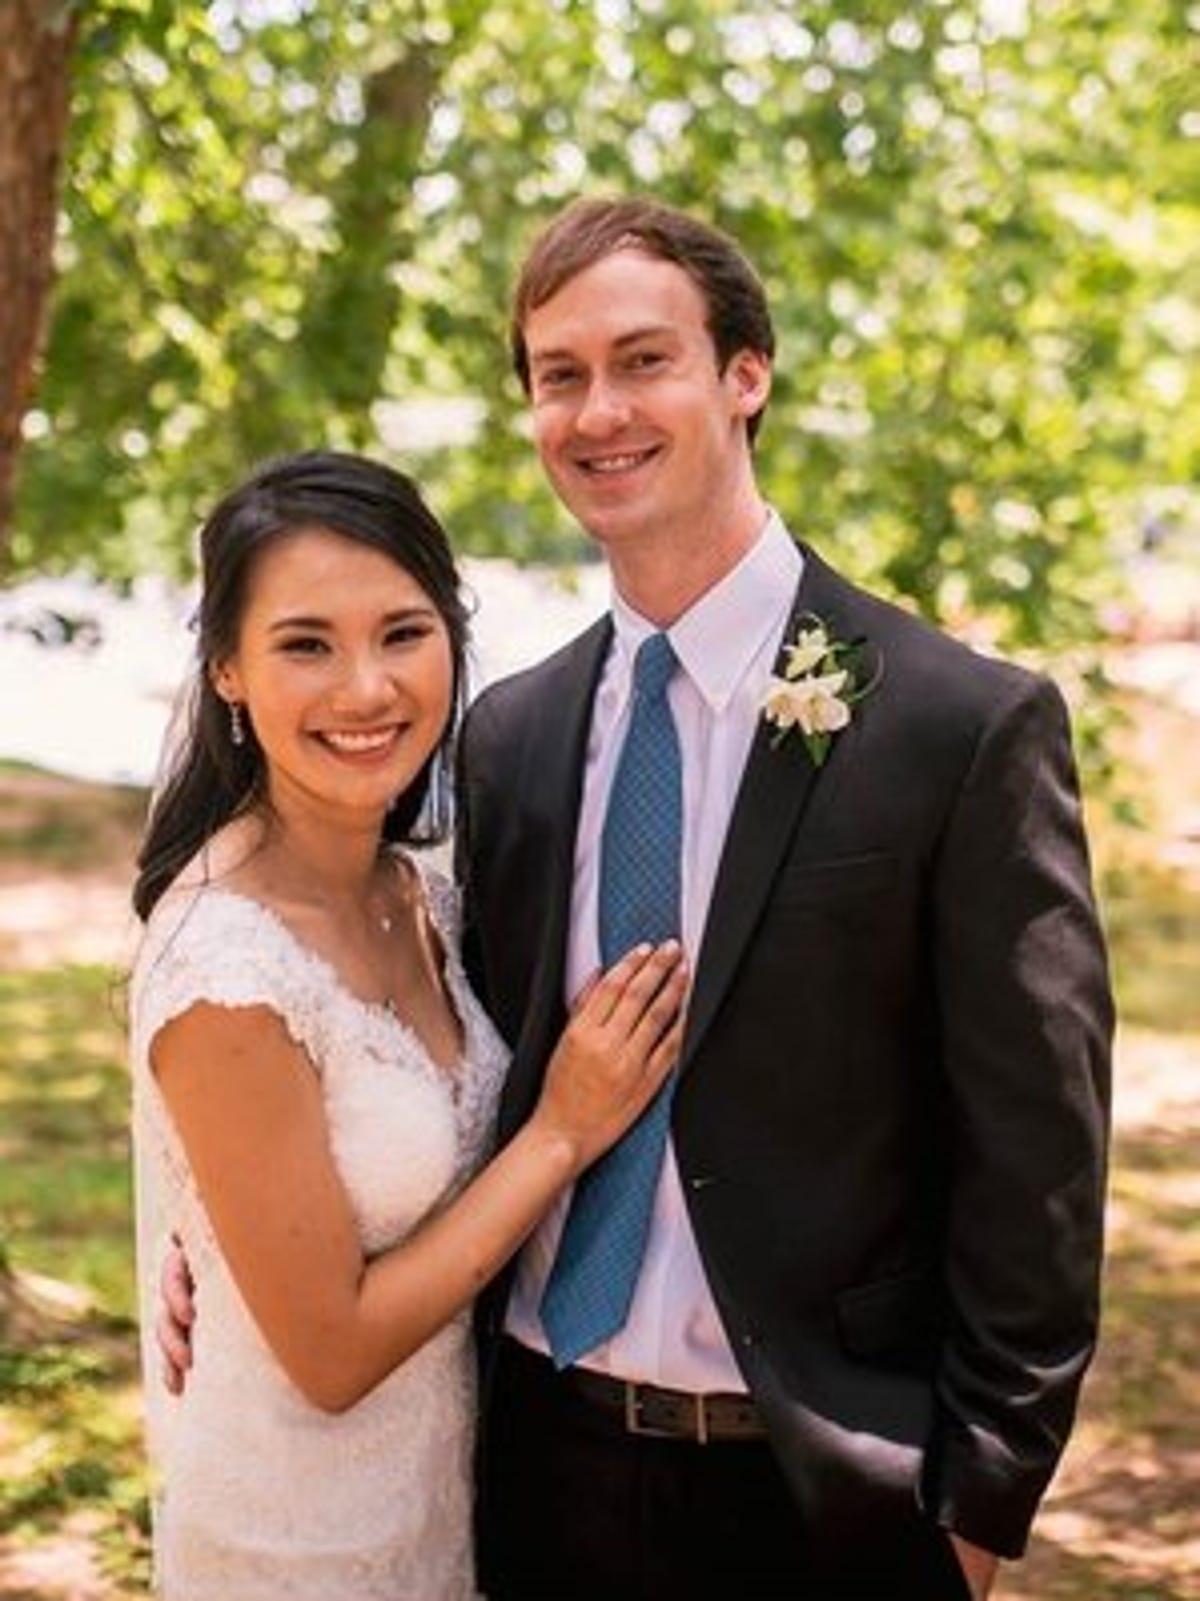 Weddings: Anh Thuy Phan & William Andrews Dennis